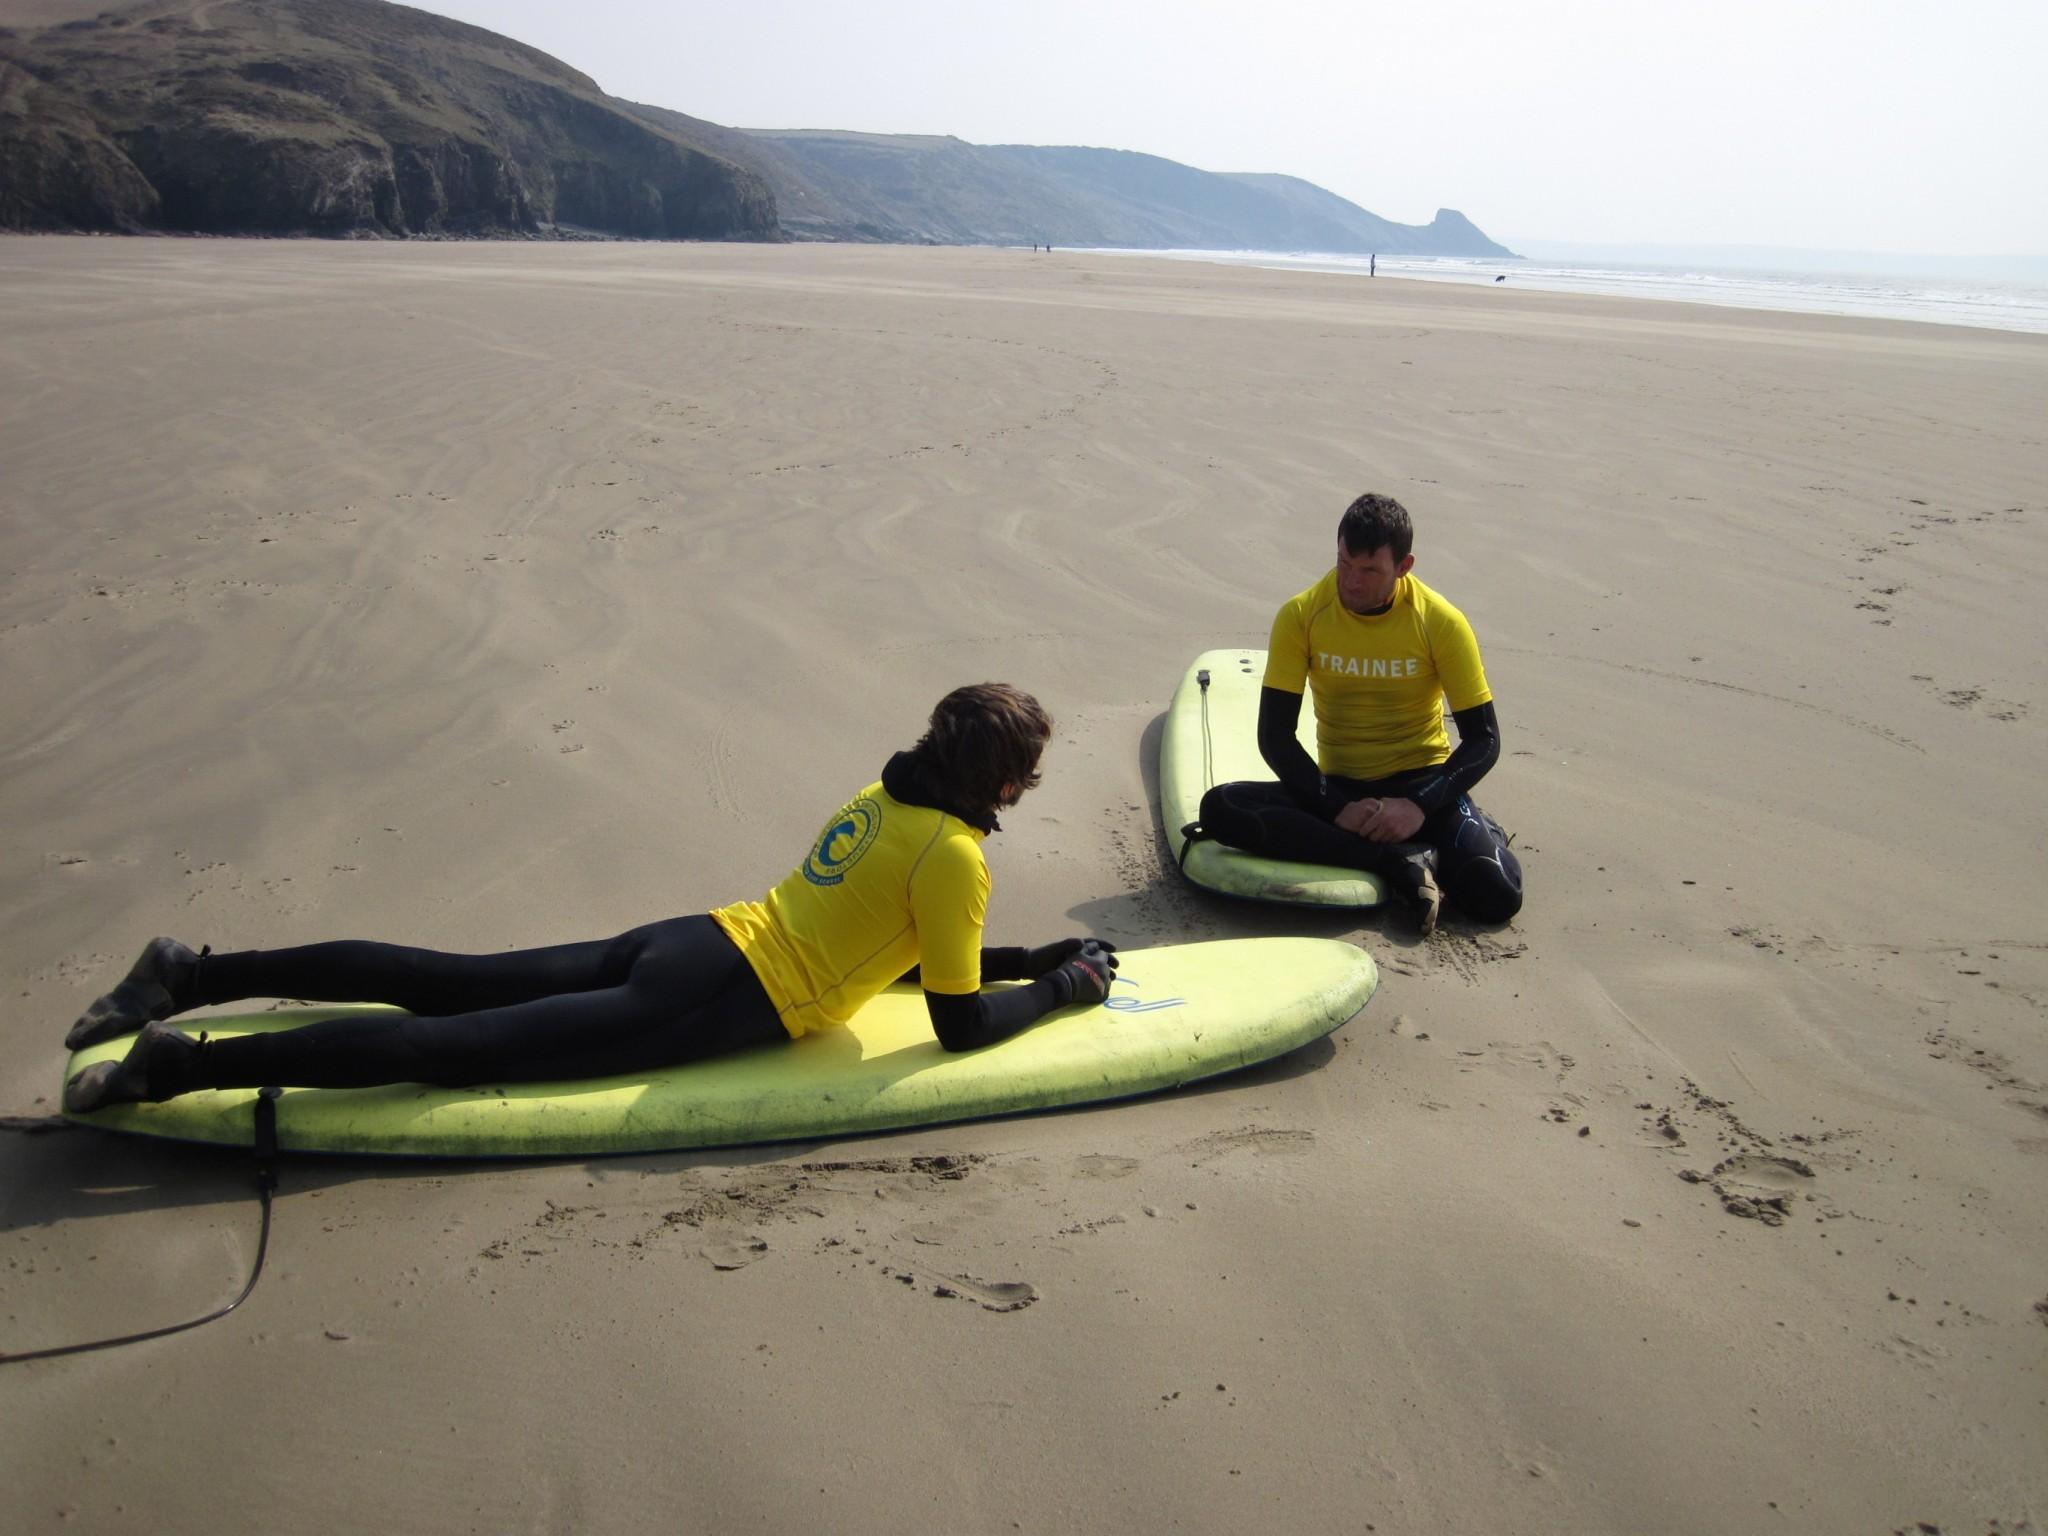 SLSGB Beach Lifeguard Course